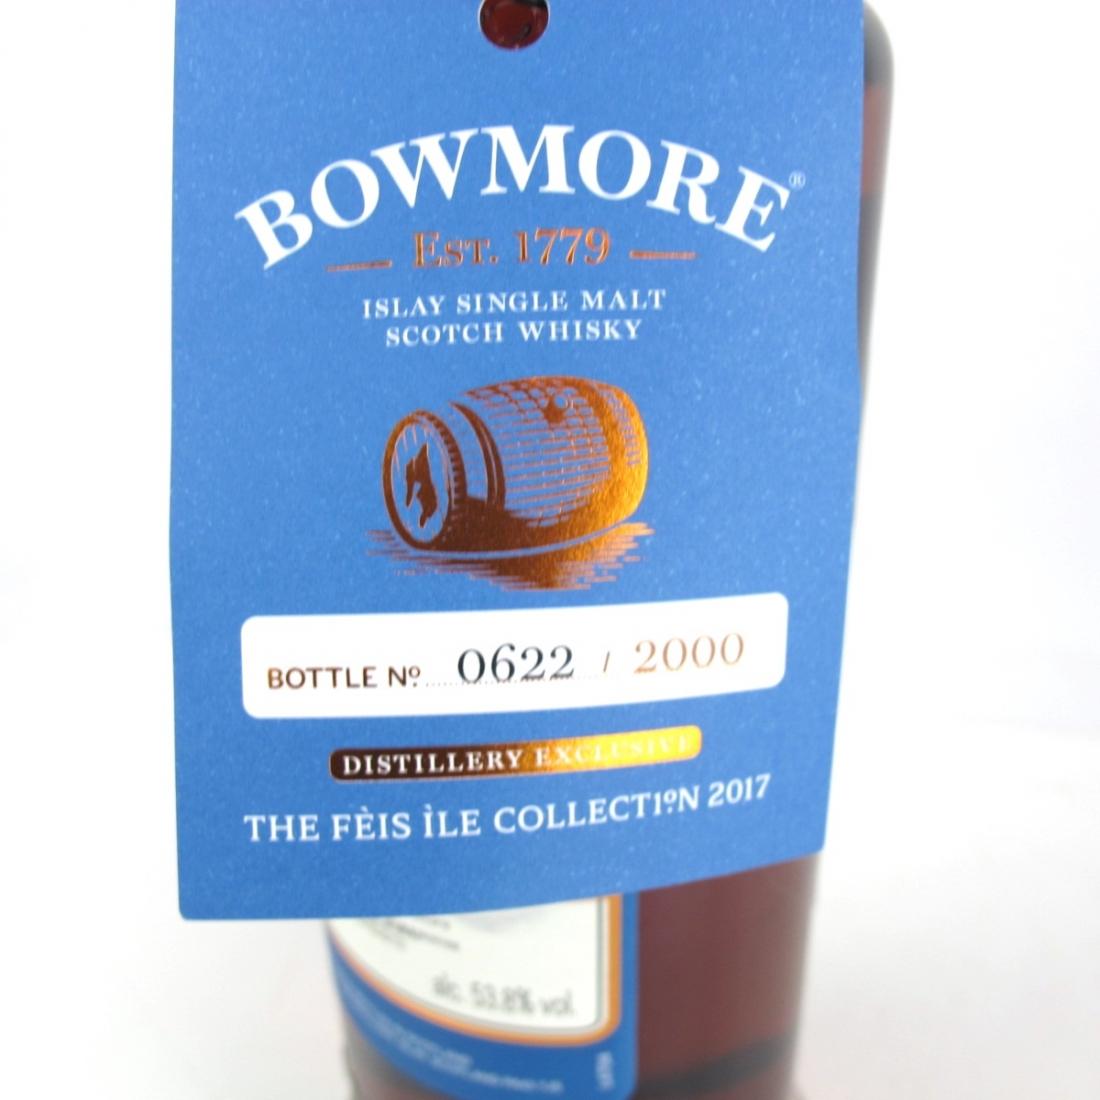 Bowmore 11 Year Old Feis Ile 2017